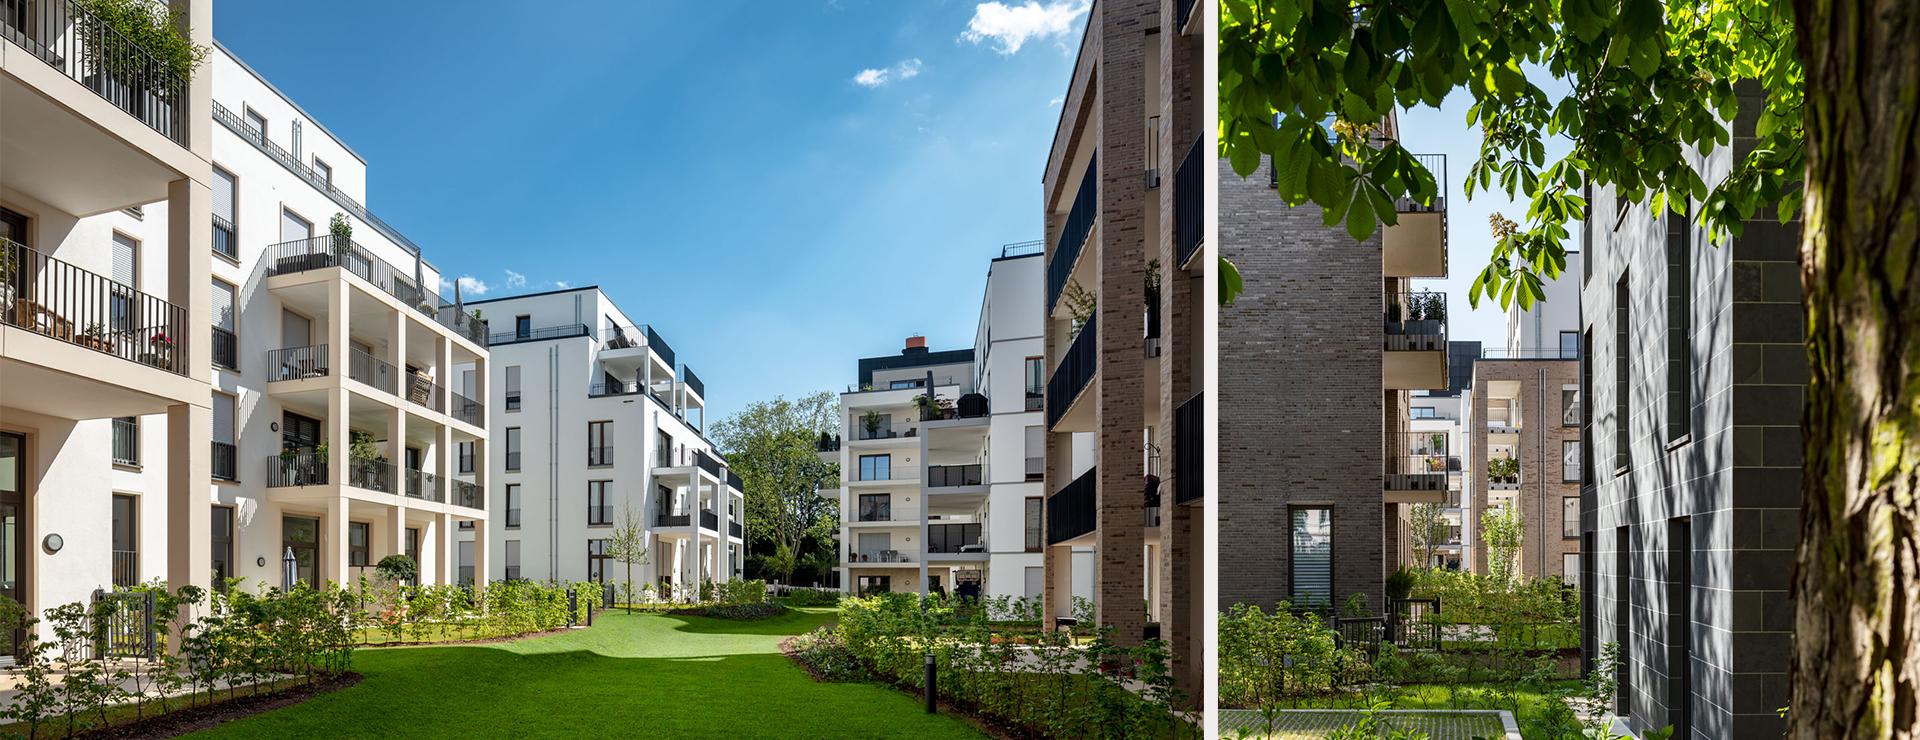 Projekt Wilhelmstraße